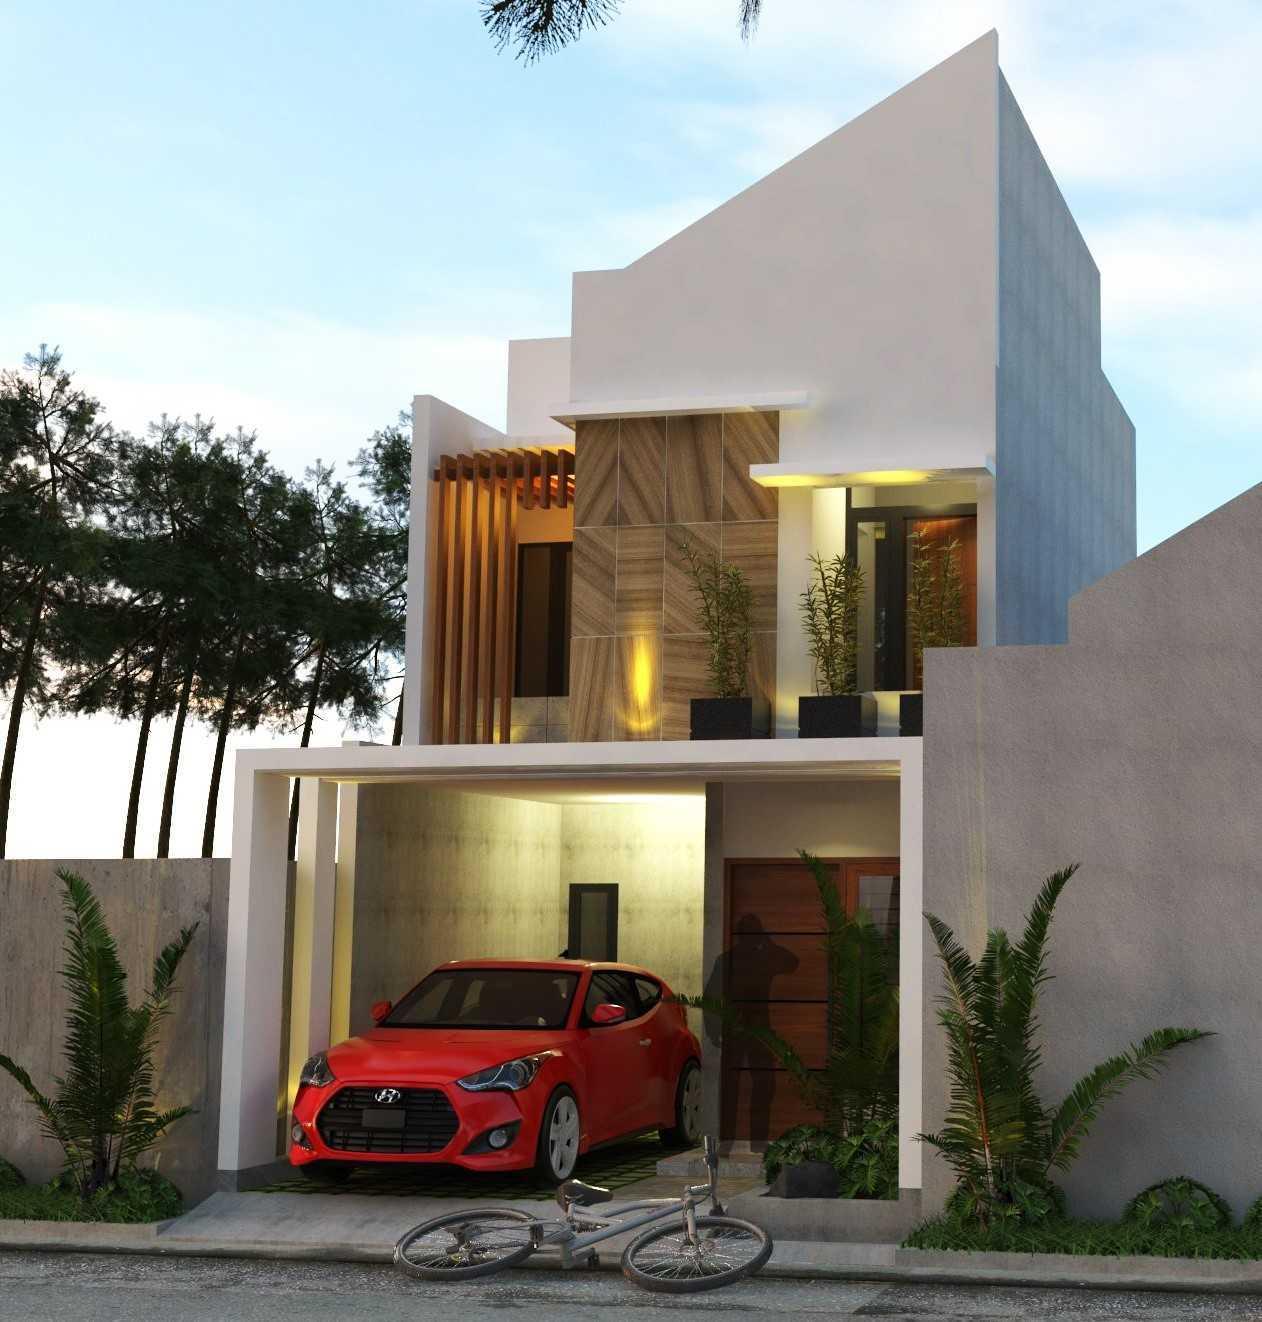 Freddy Rumah Gonilan Surakarta Surakarta Type5X165  22793